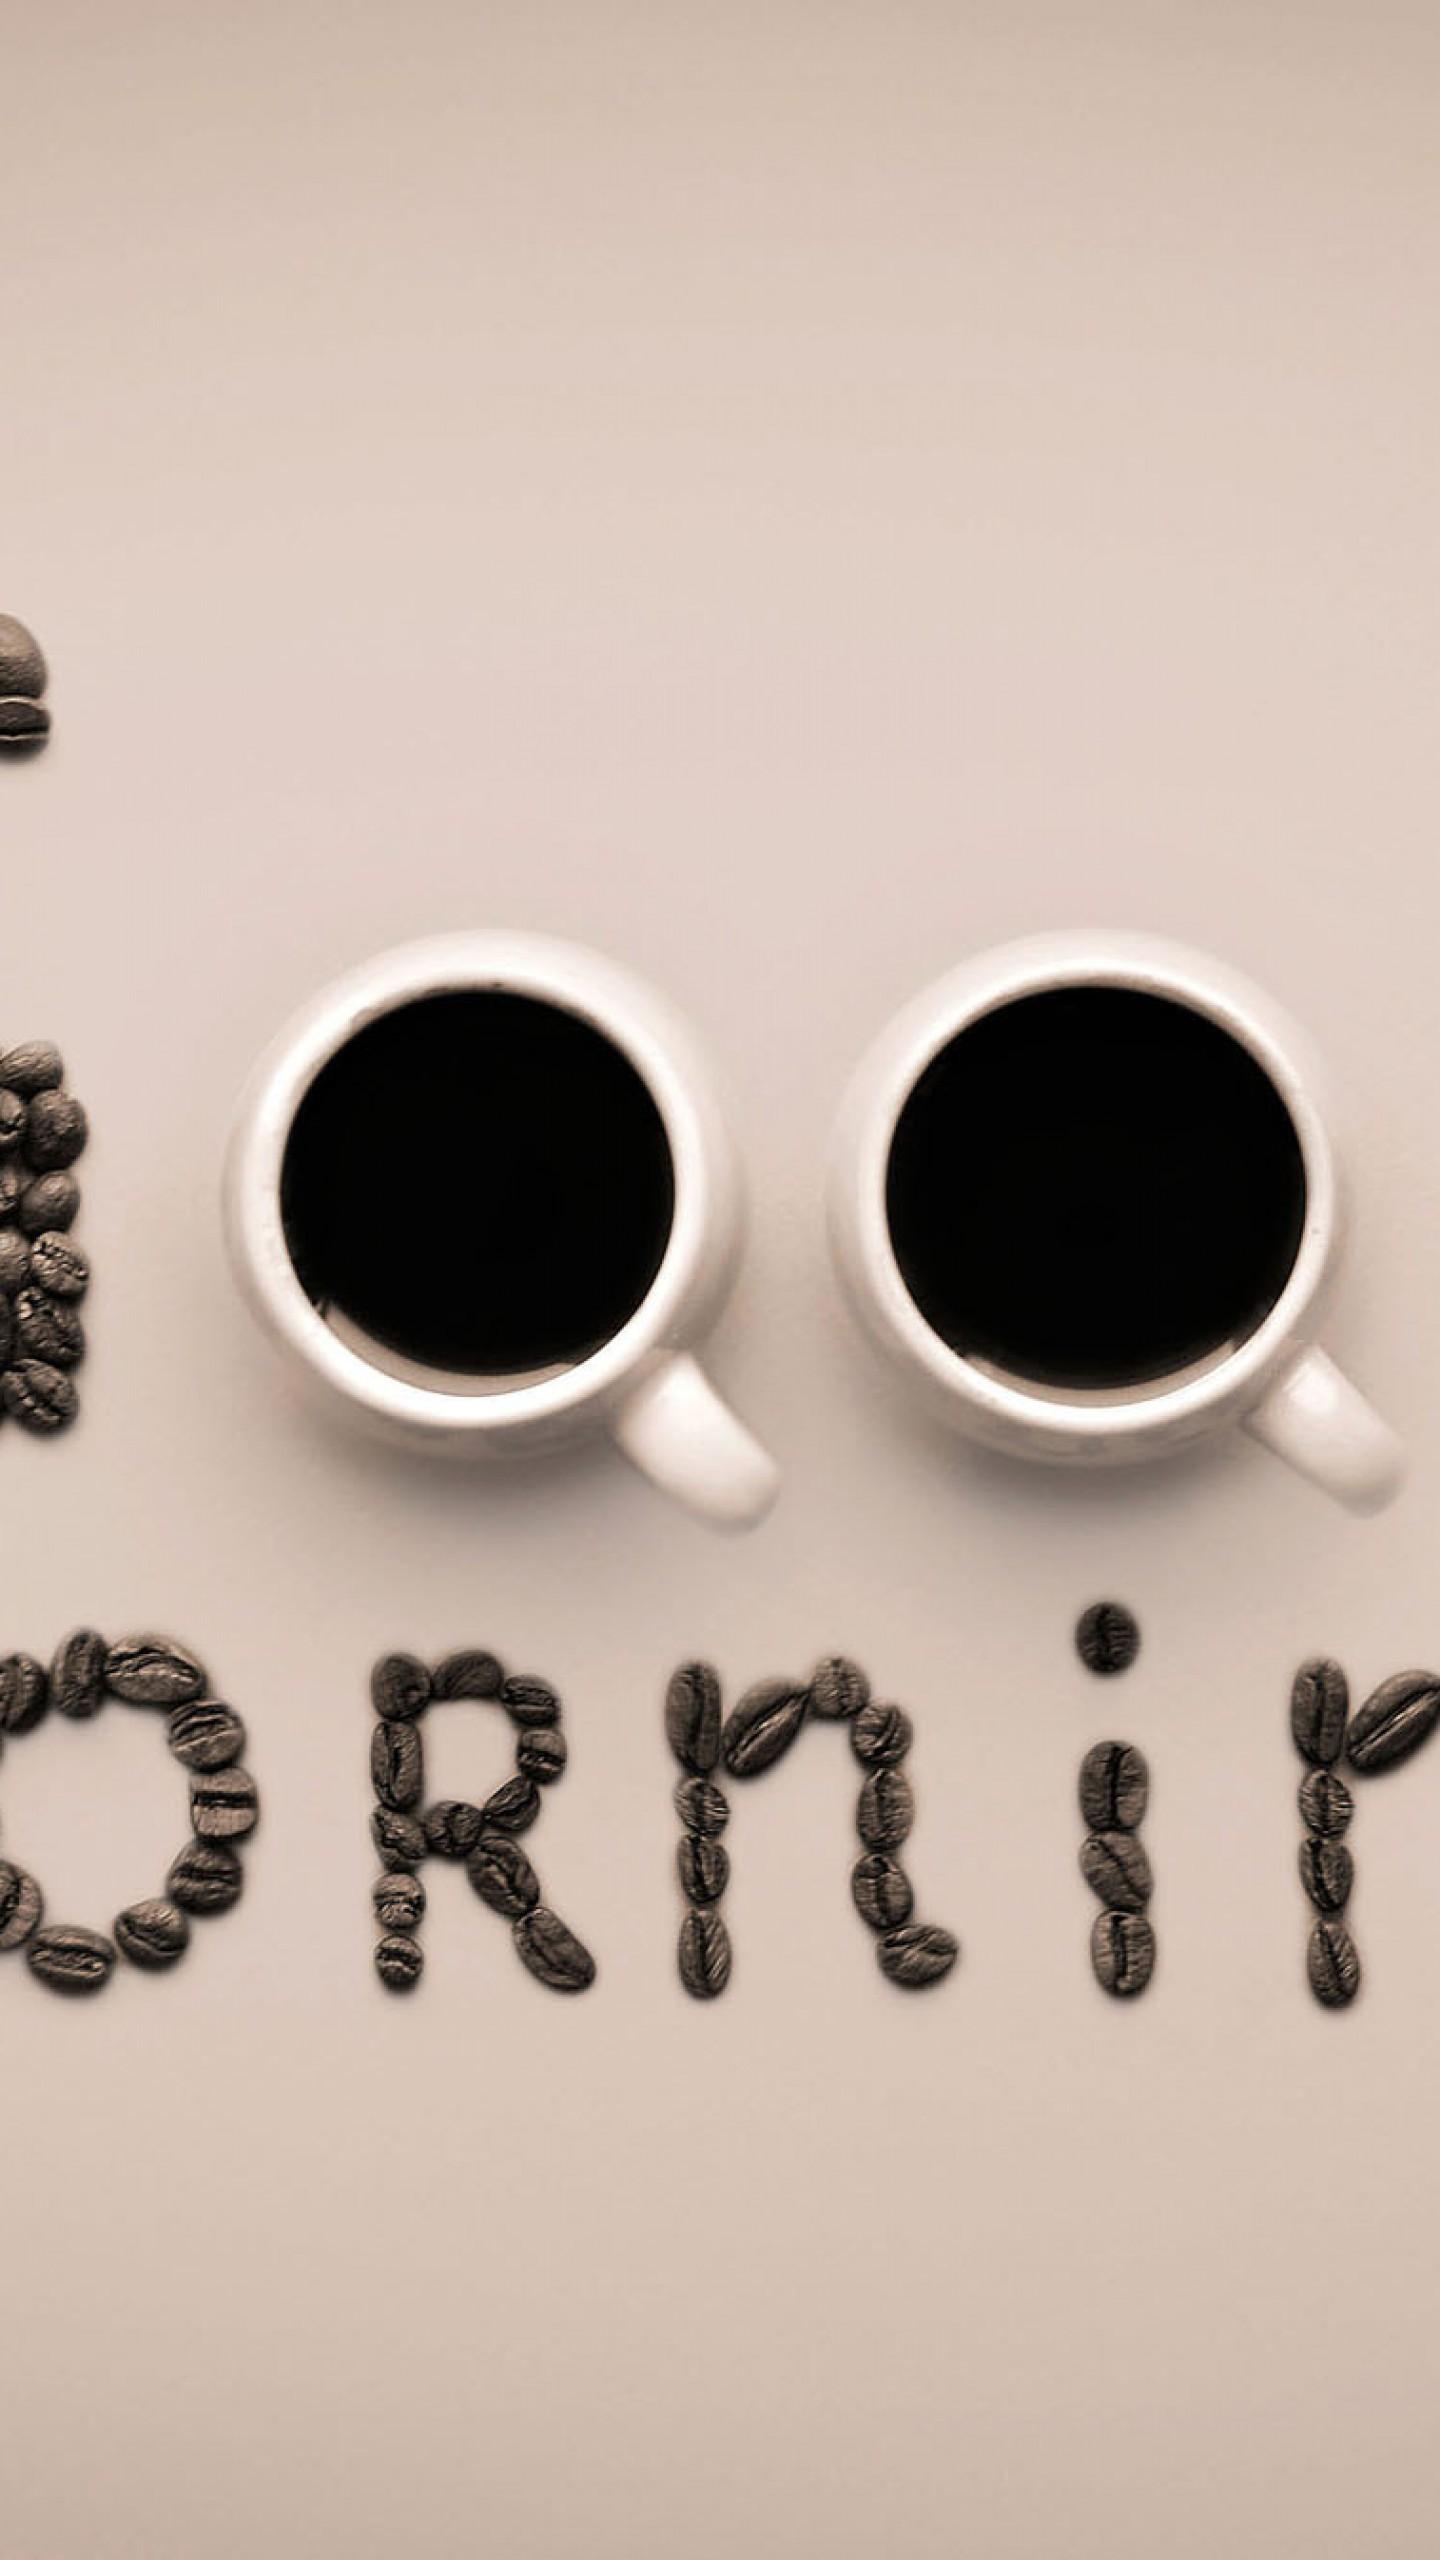 عکس زمینه سبک زندگی با دو لیوان قهوه پس زمینه